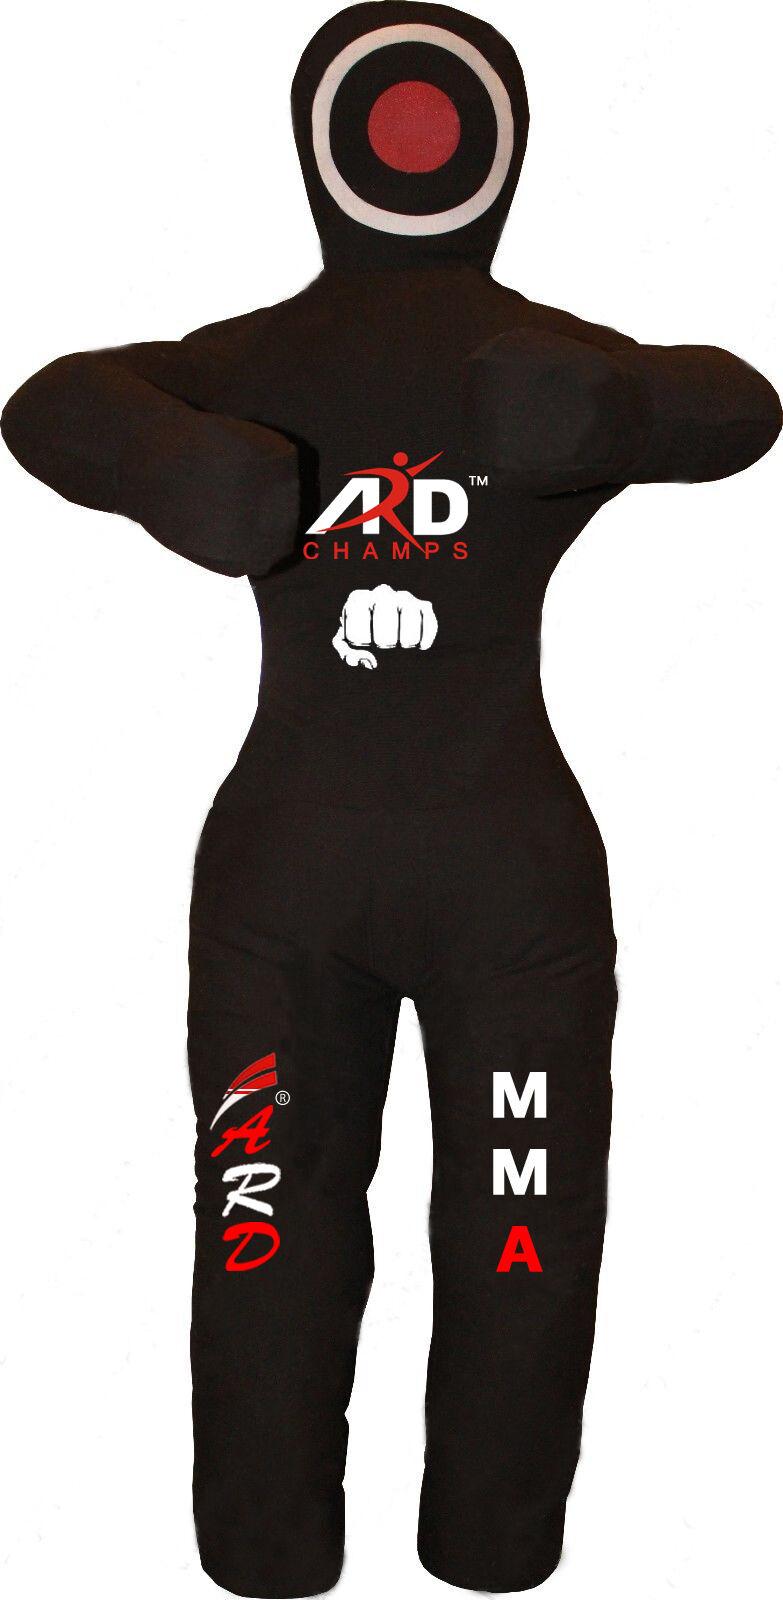 2Fit™ Brazilian Jiu Jitsu Straight Grappling Canvas Dummy MMA Wrestling Judo Blk